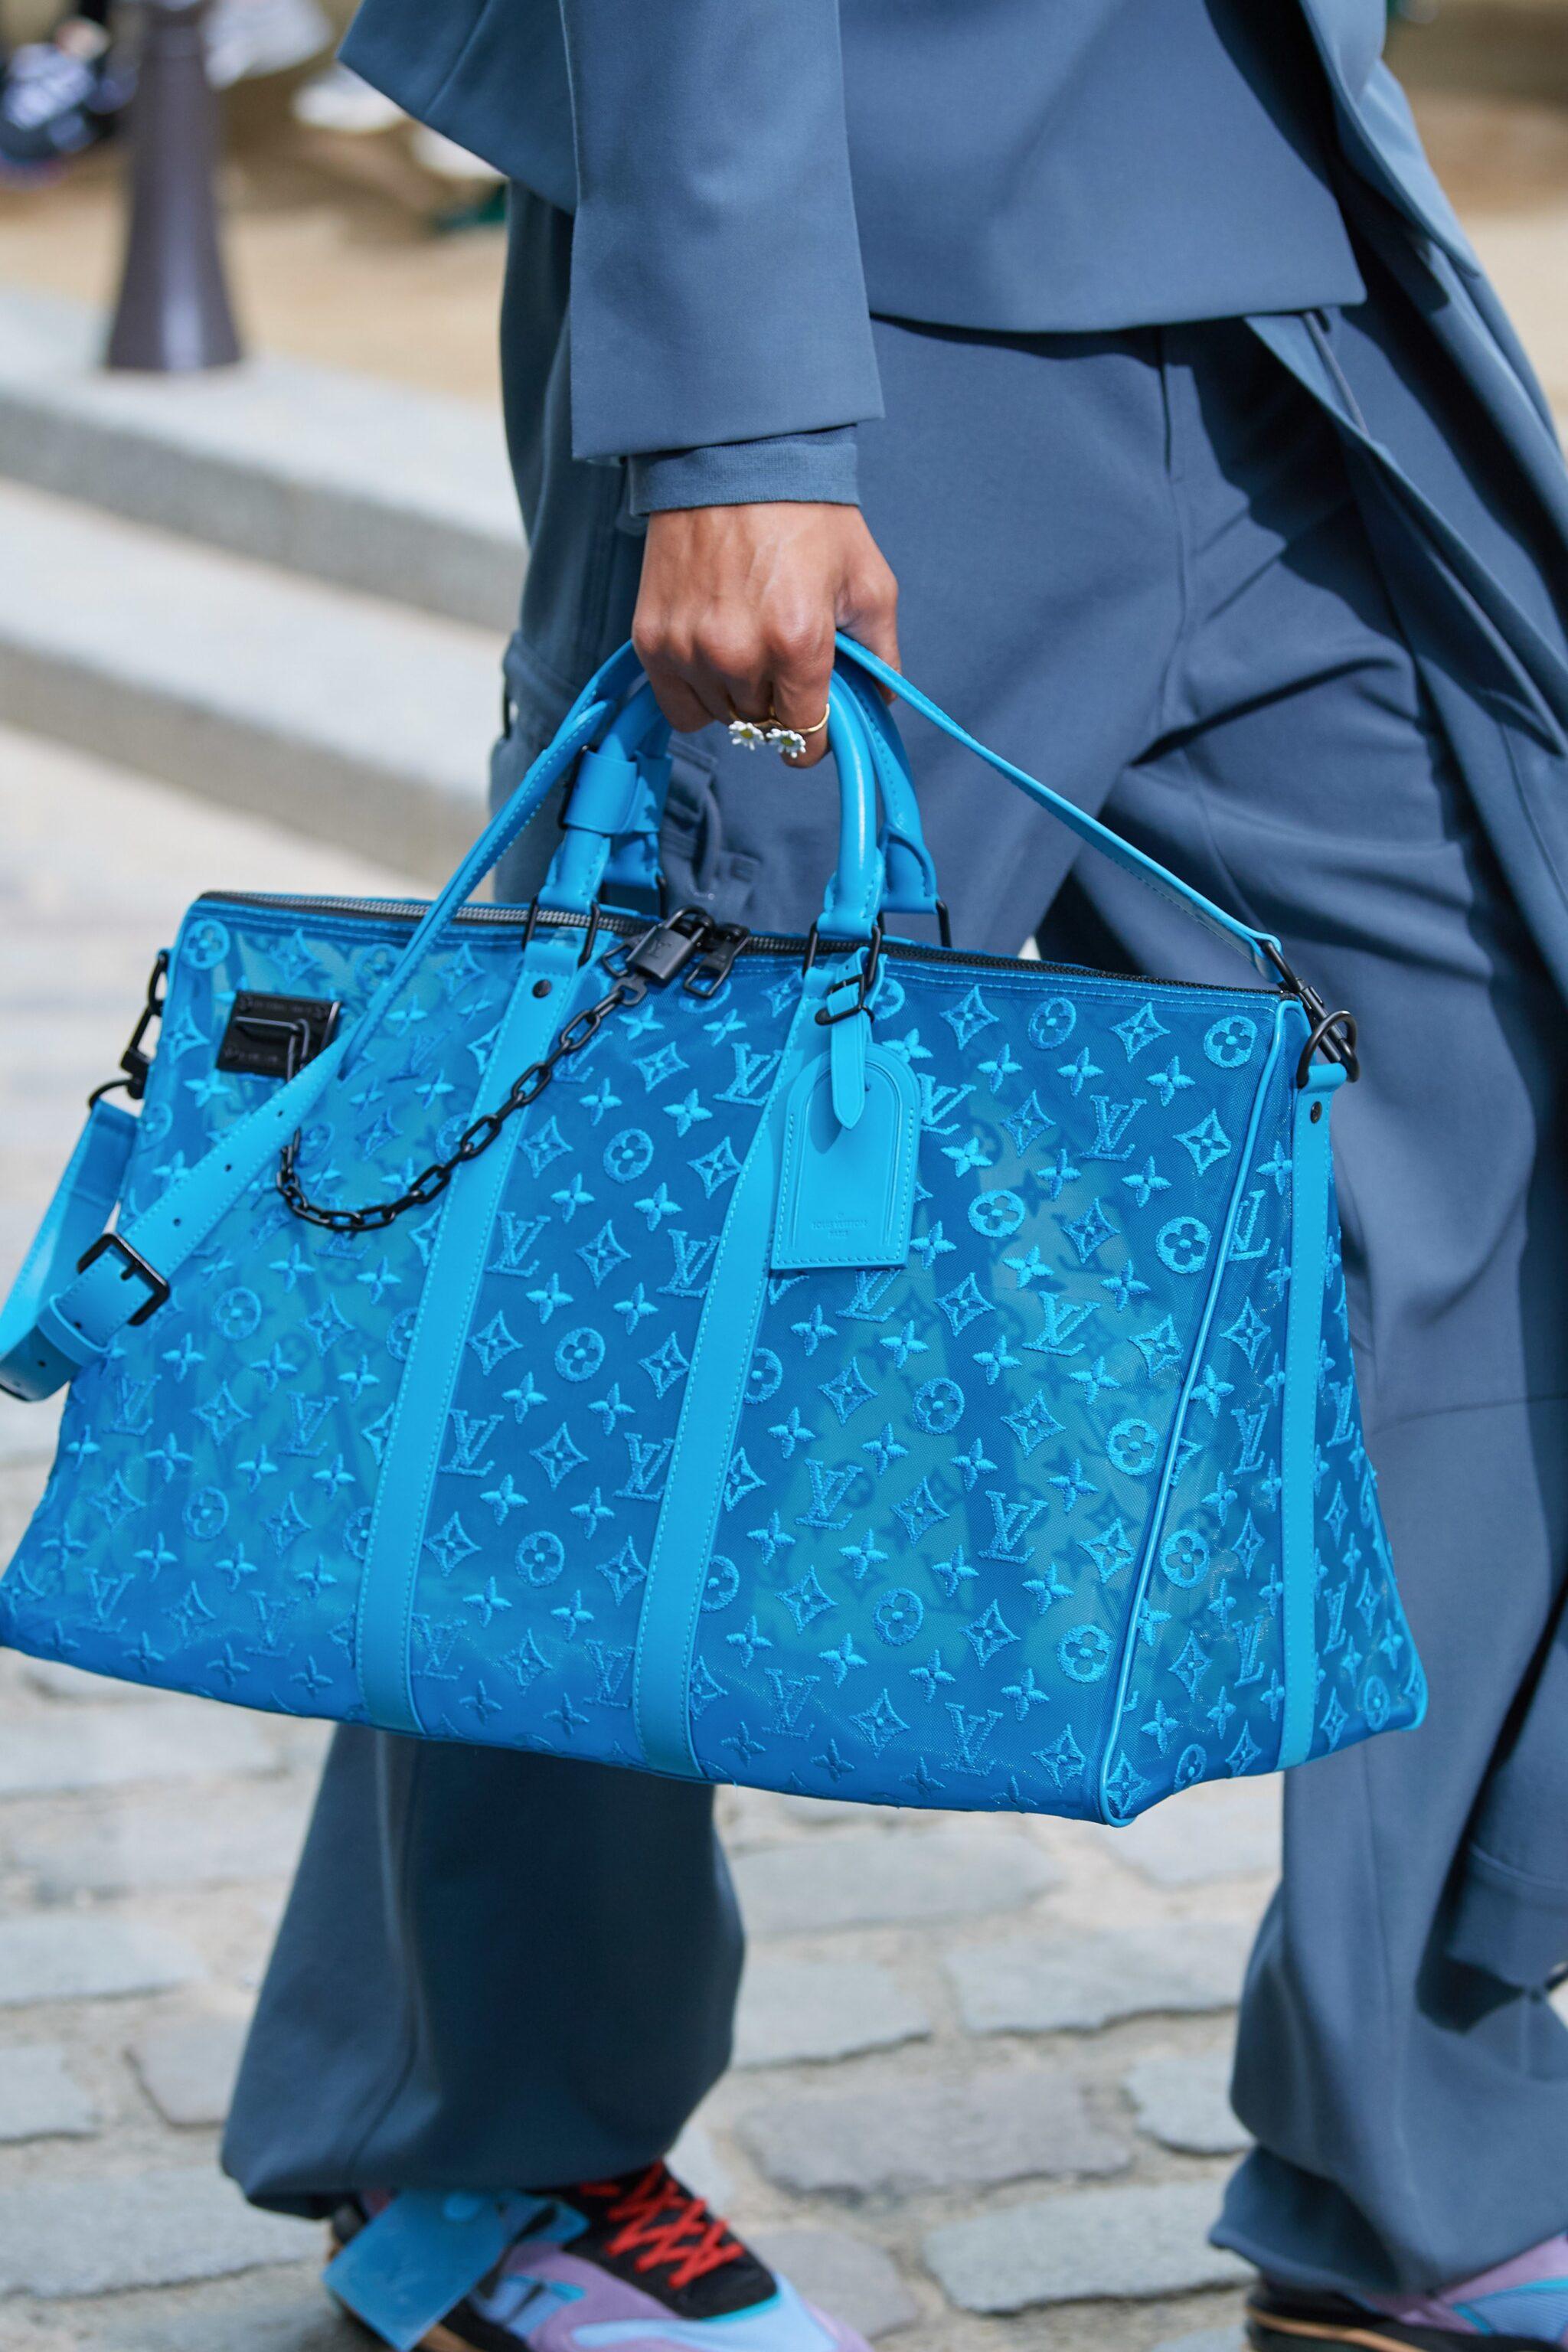 vuitton louis bag spring bags summer runway mens duffle vogue monogram virgil debuts purseblog stockx